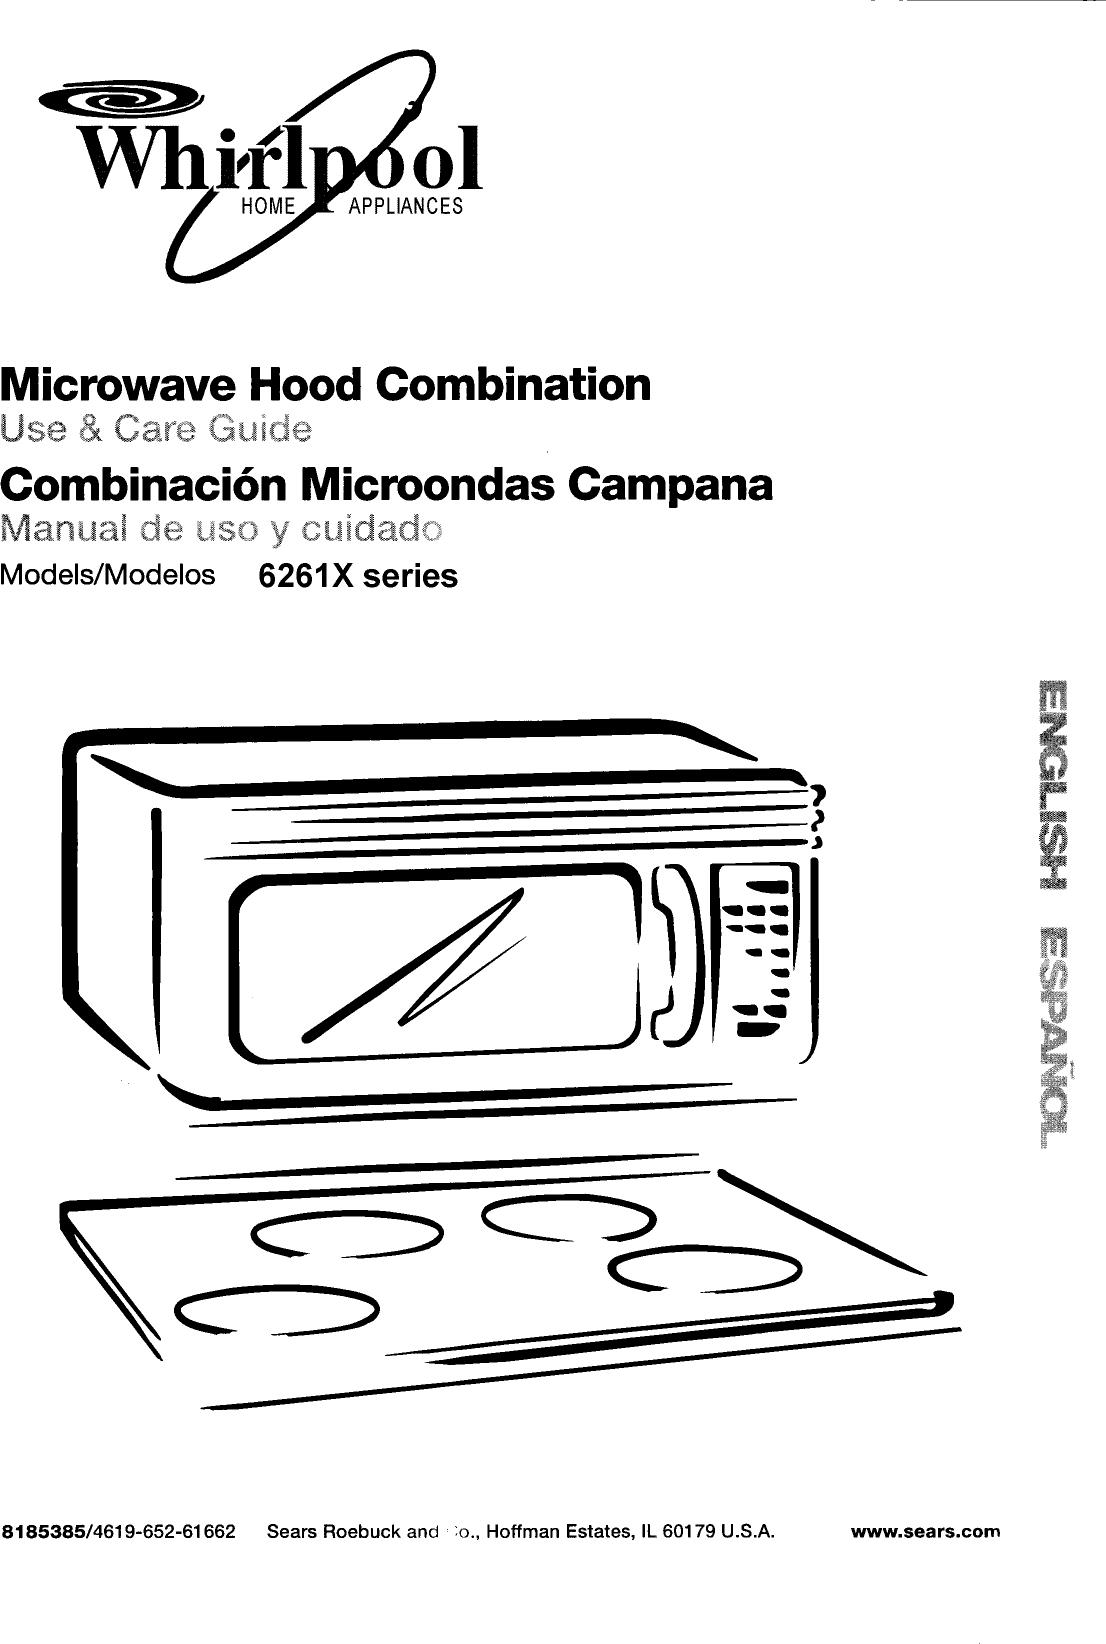 Whirlpool gold microwave troubleshooting bestmicrowave - Whirlpool problems ...